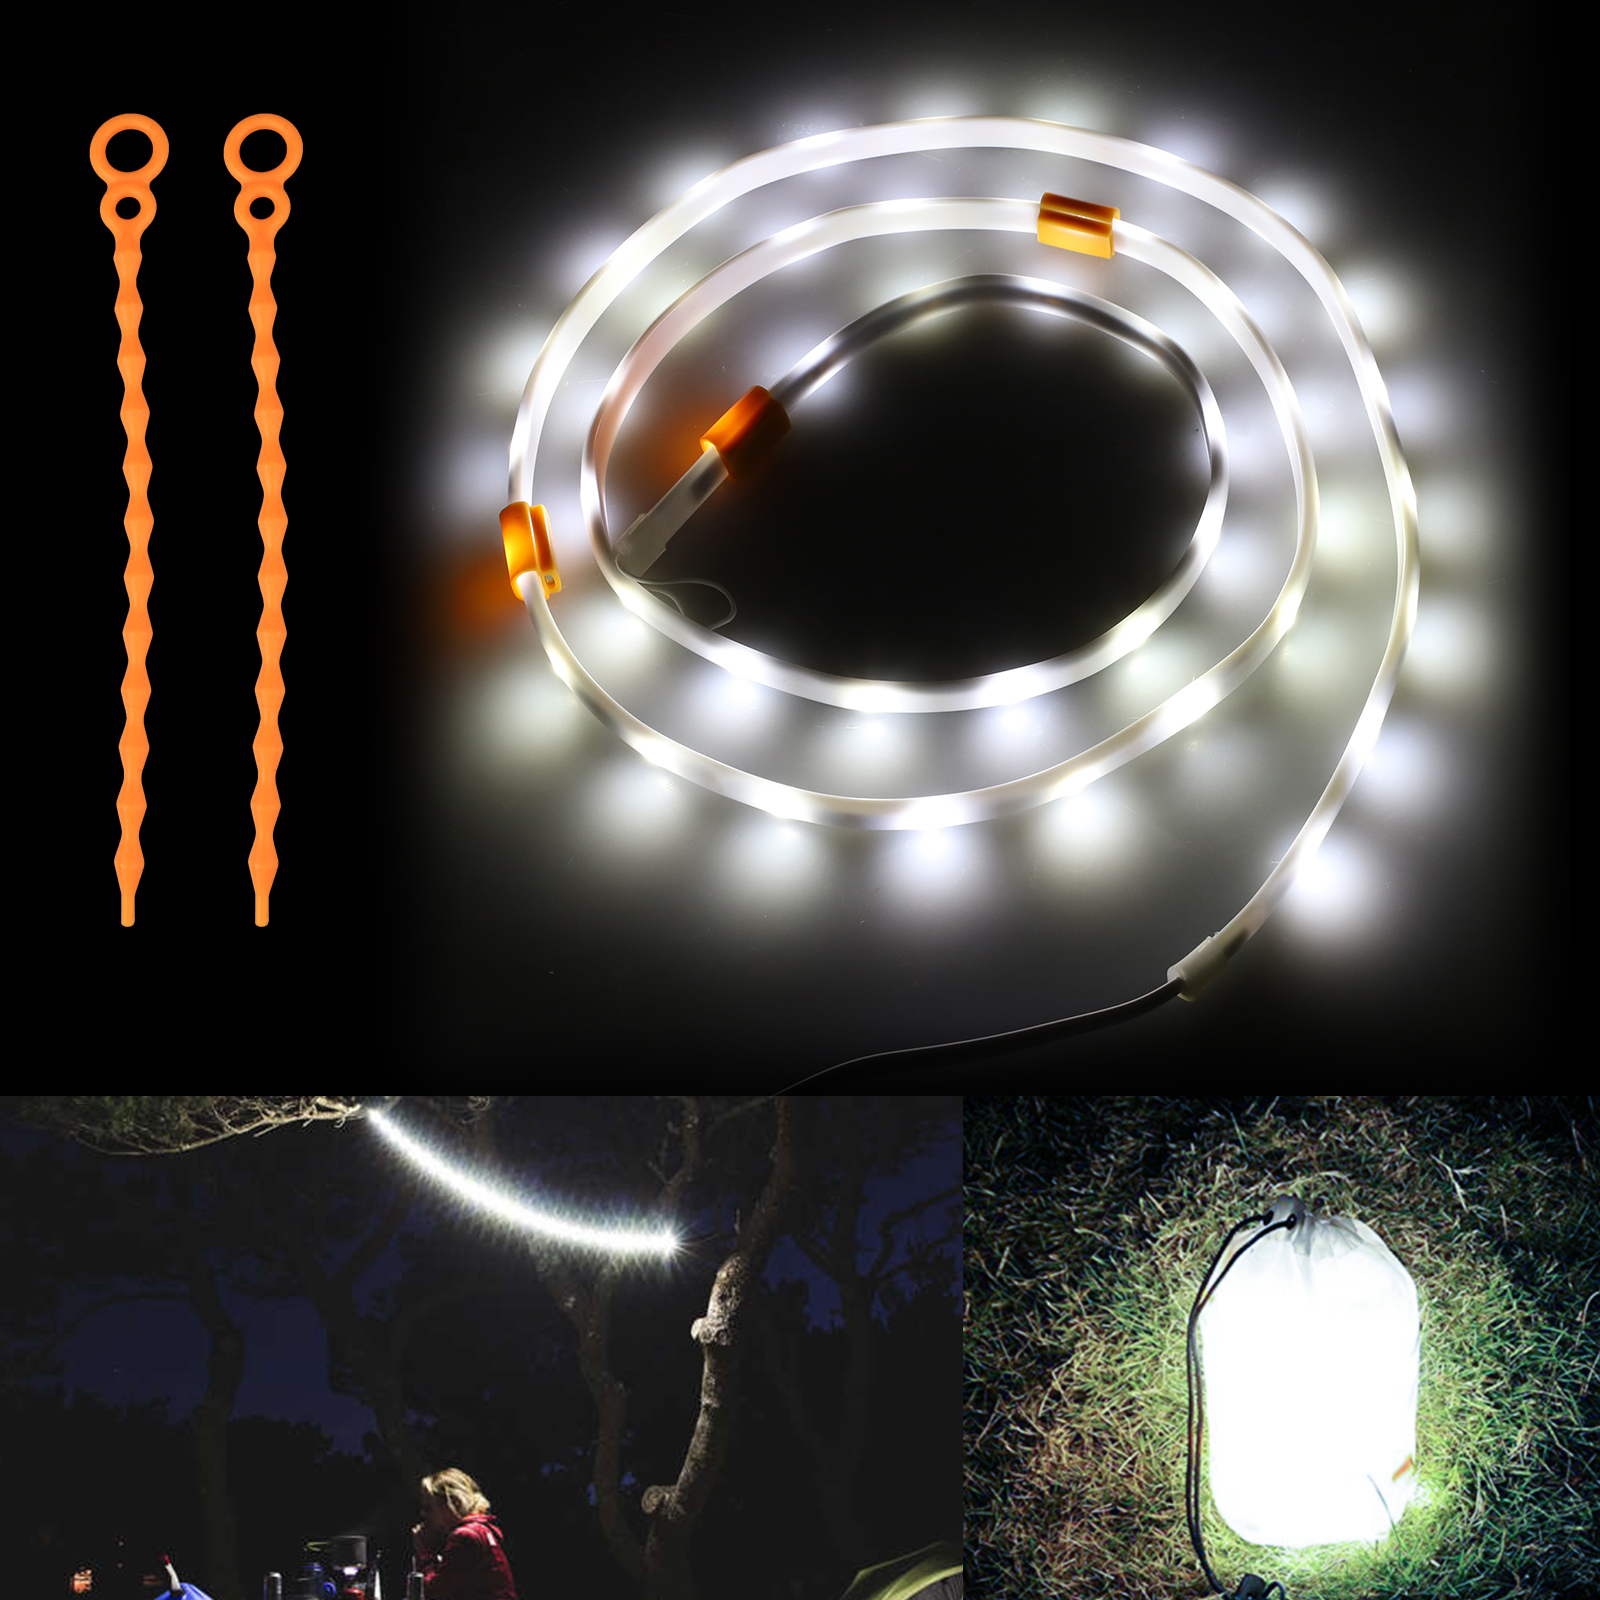 Outdoor Strip Light Lantern USB Power Strip Kohree Portable LED Rope Lights Stri